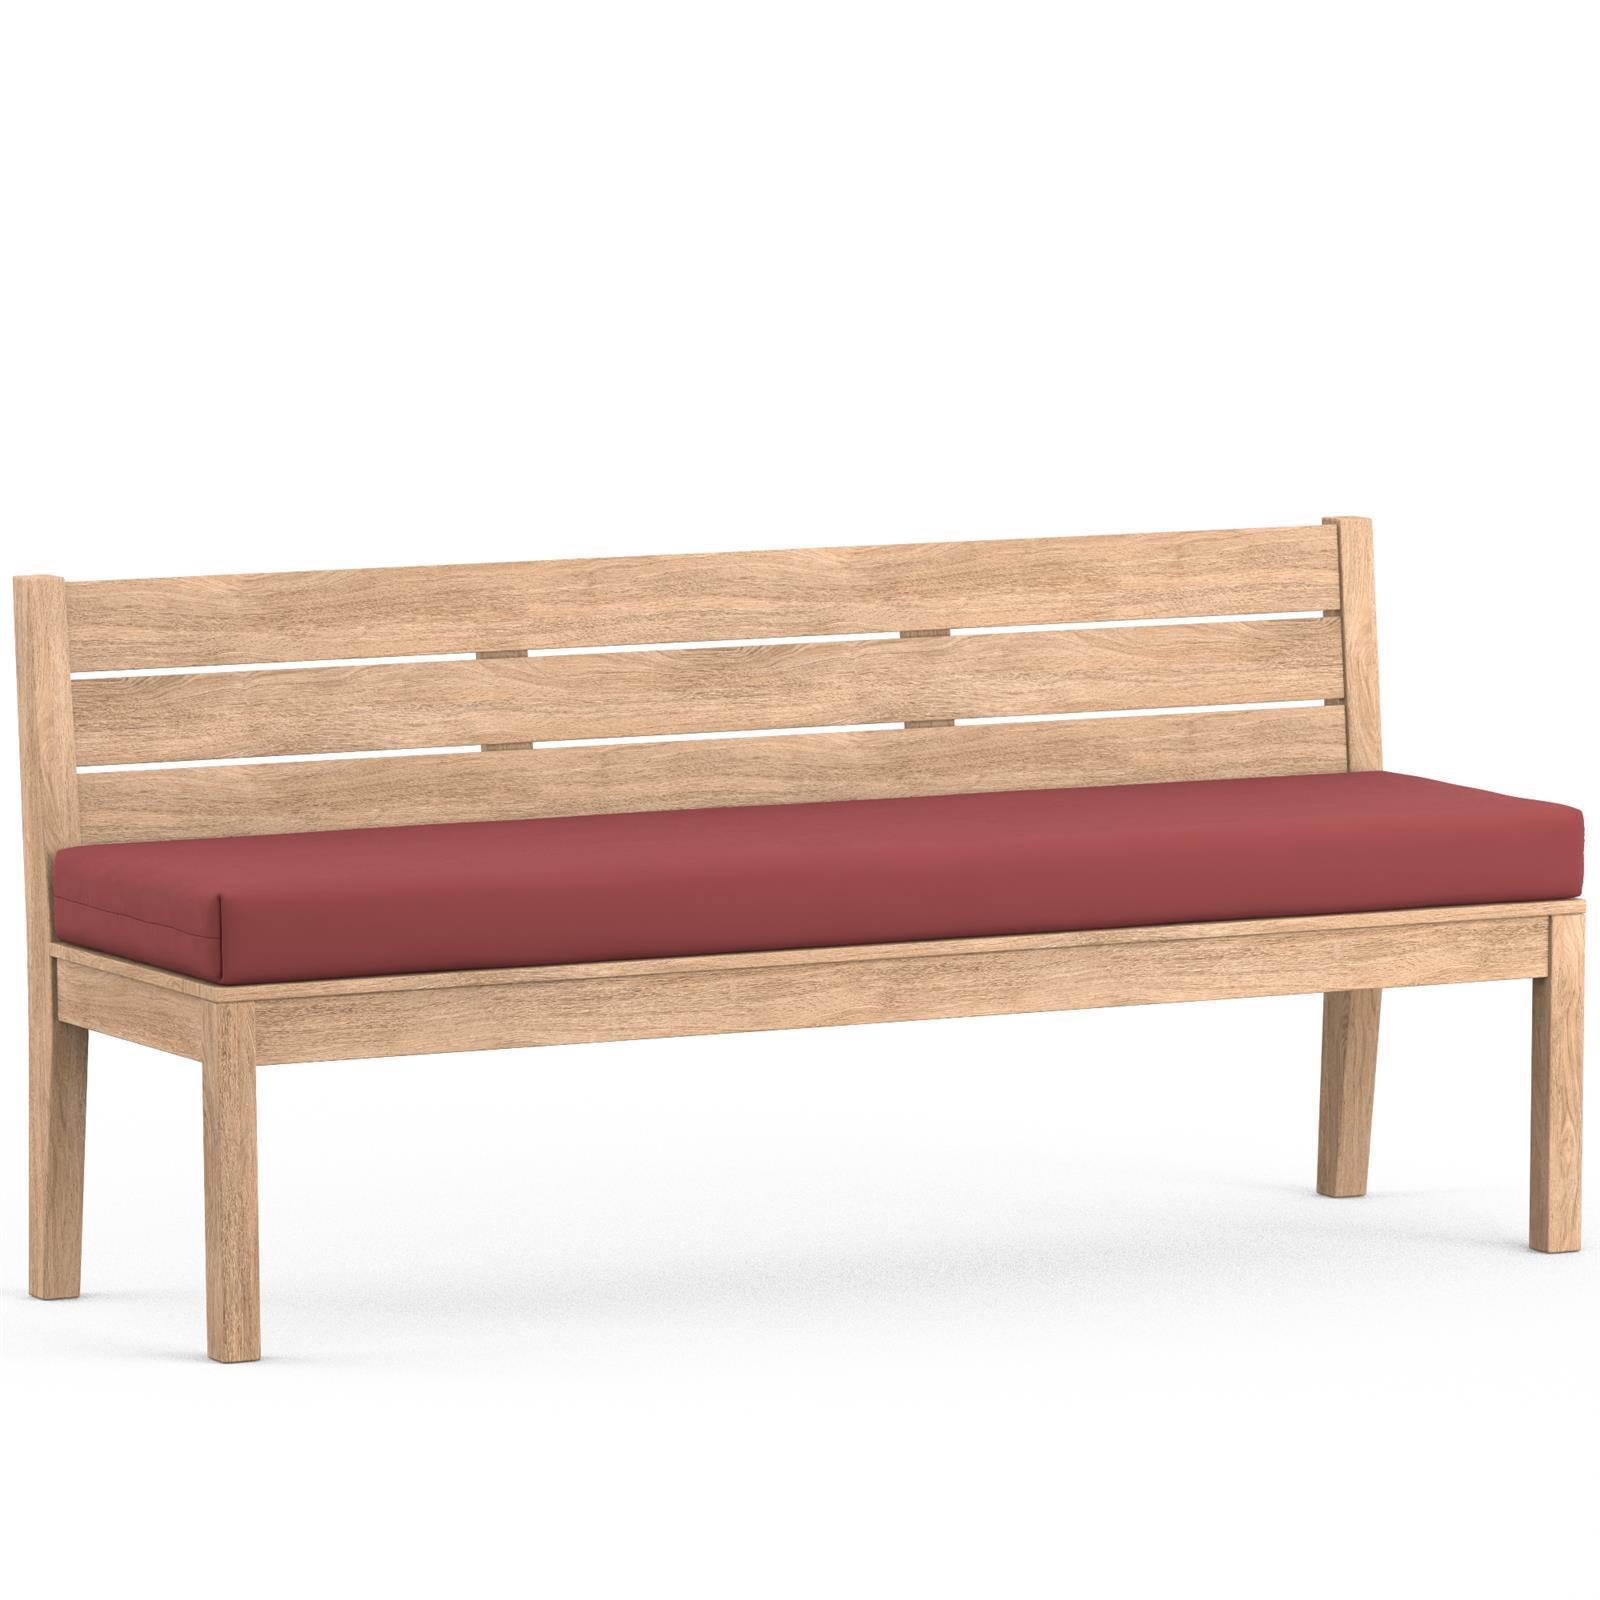 bankauflage nach ma bezug abziehbar stegsaum 50 stoffe. Black Bedroom Furniture Sets. Home Design Ideas